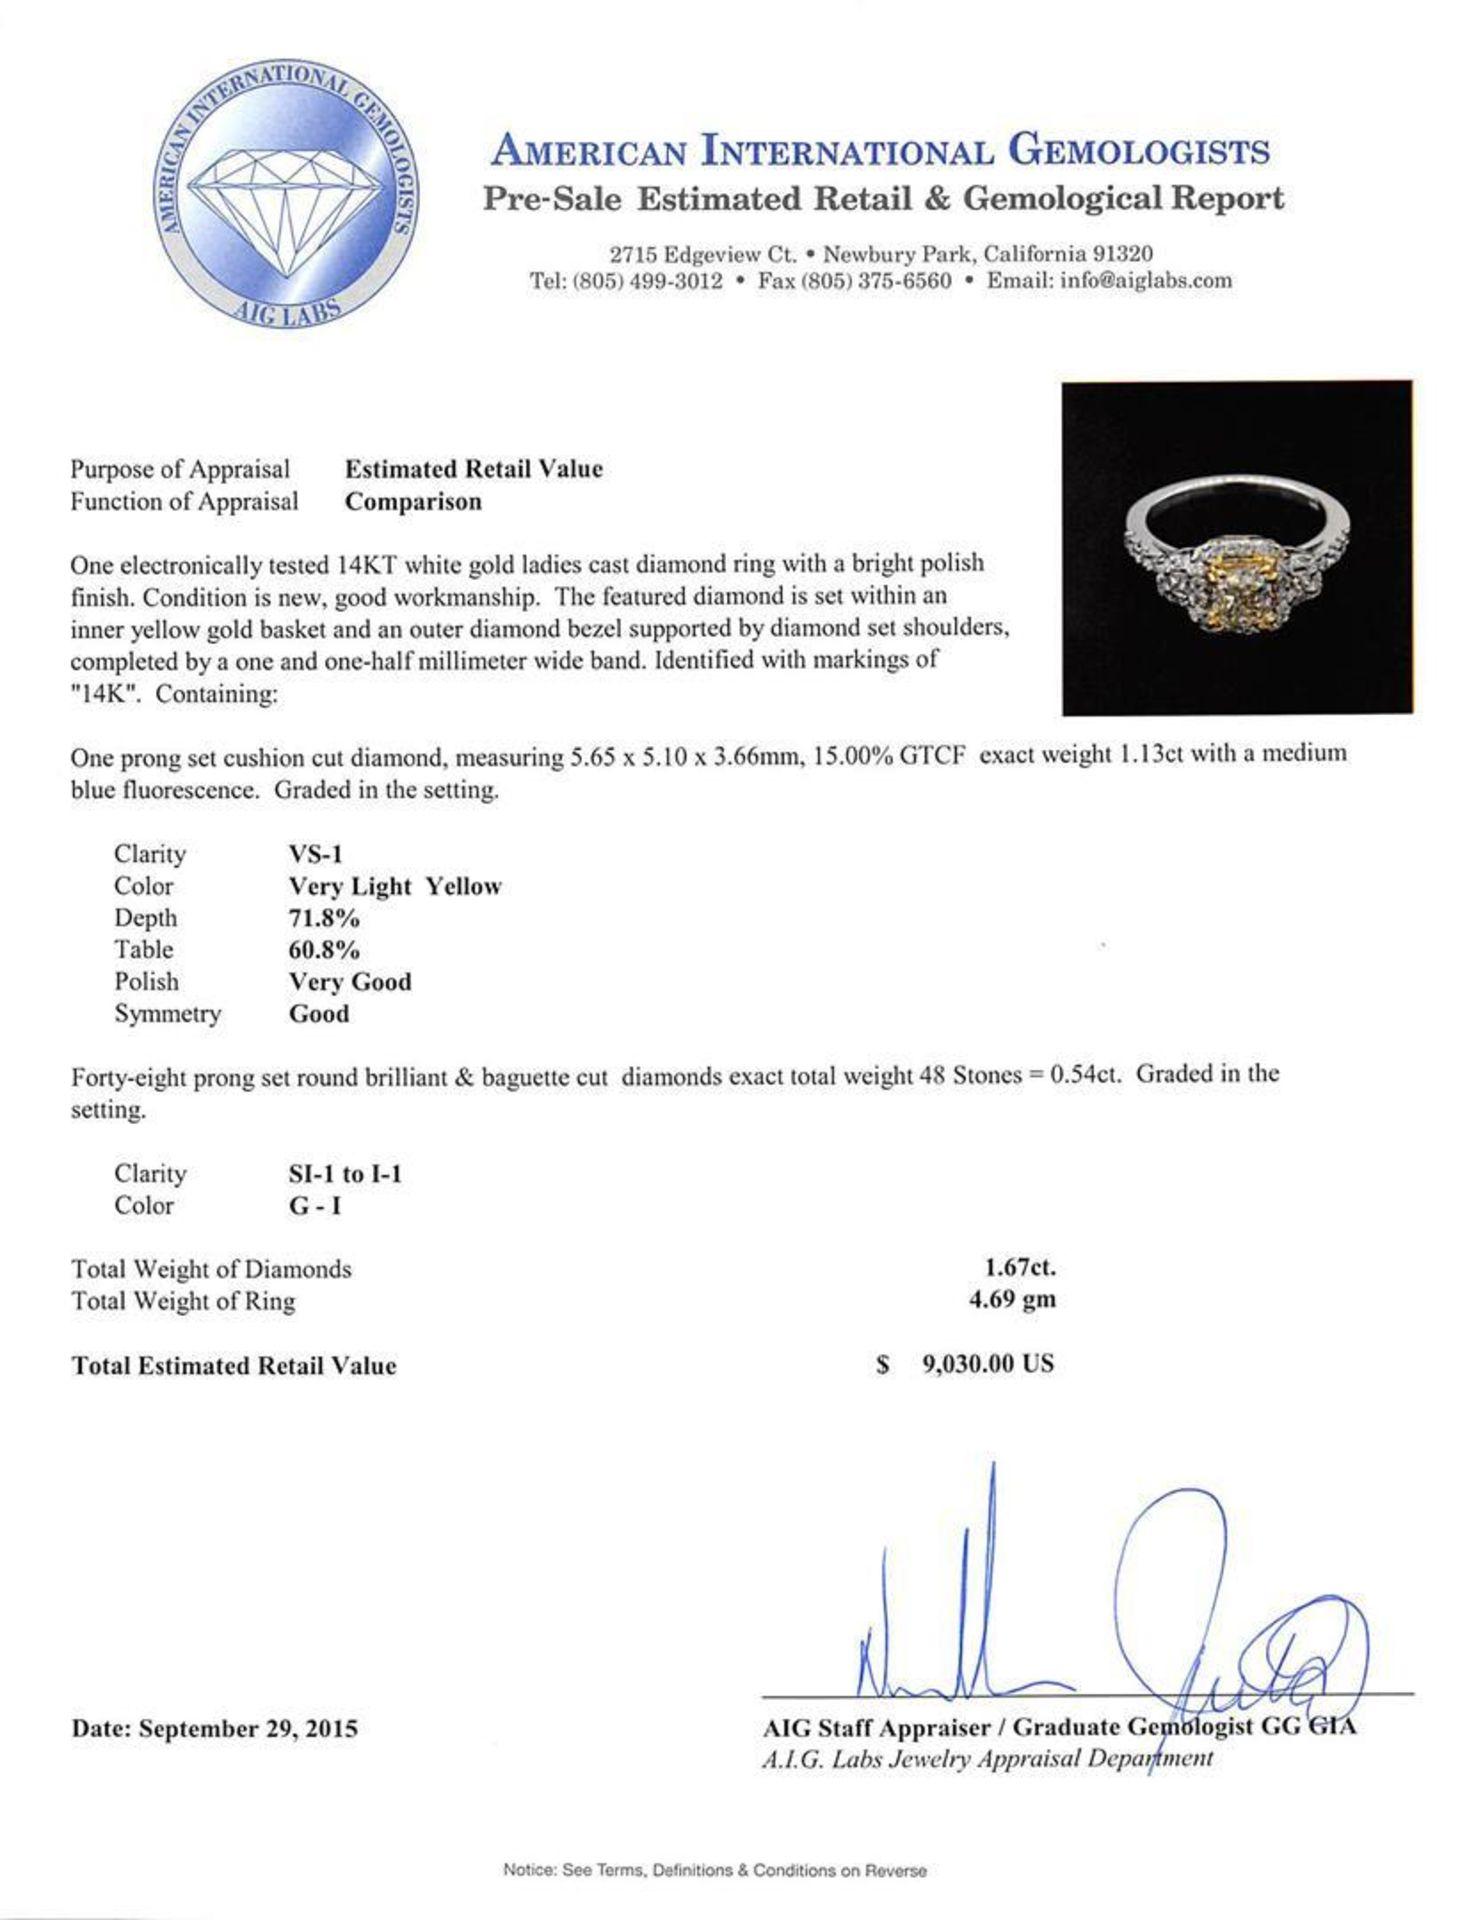 1.67 ctw Light Yellow Diamond Ring - 14KT White Gold - Image 3 of 3